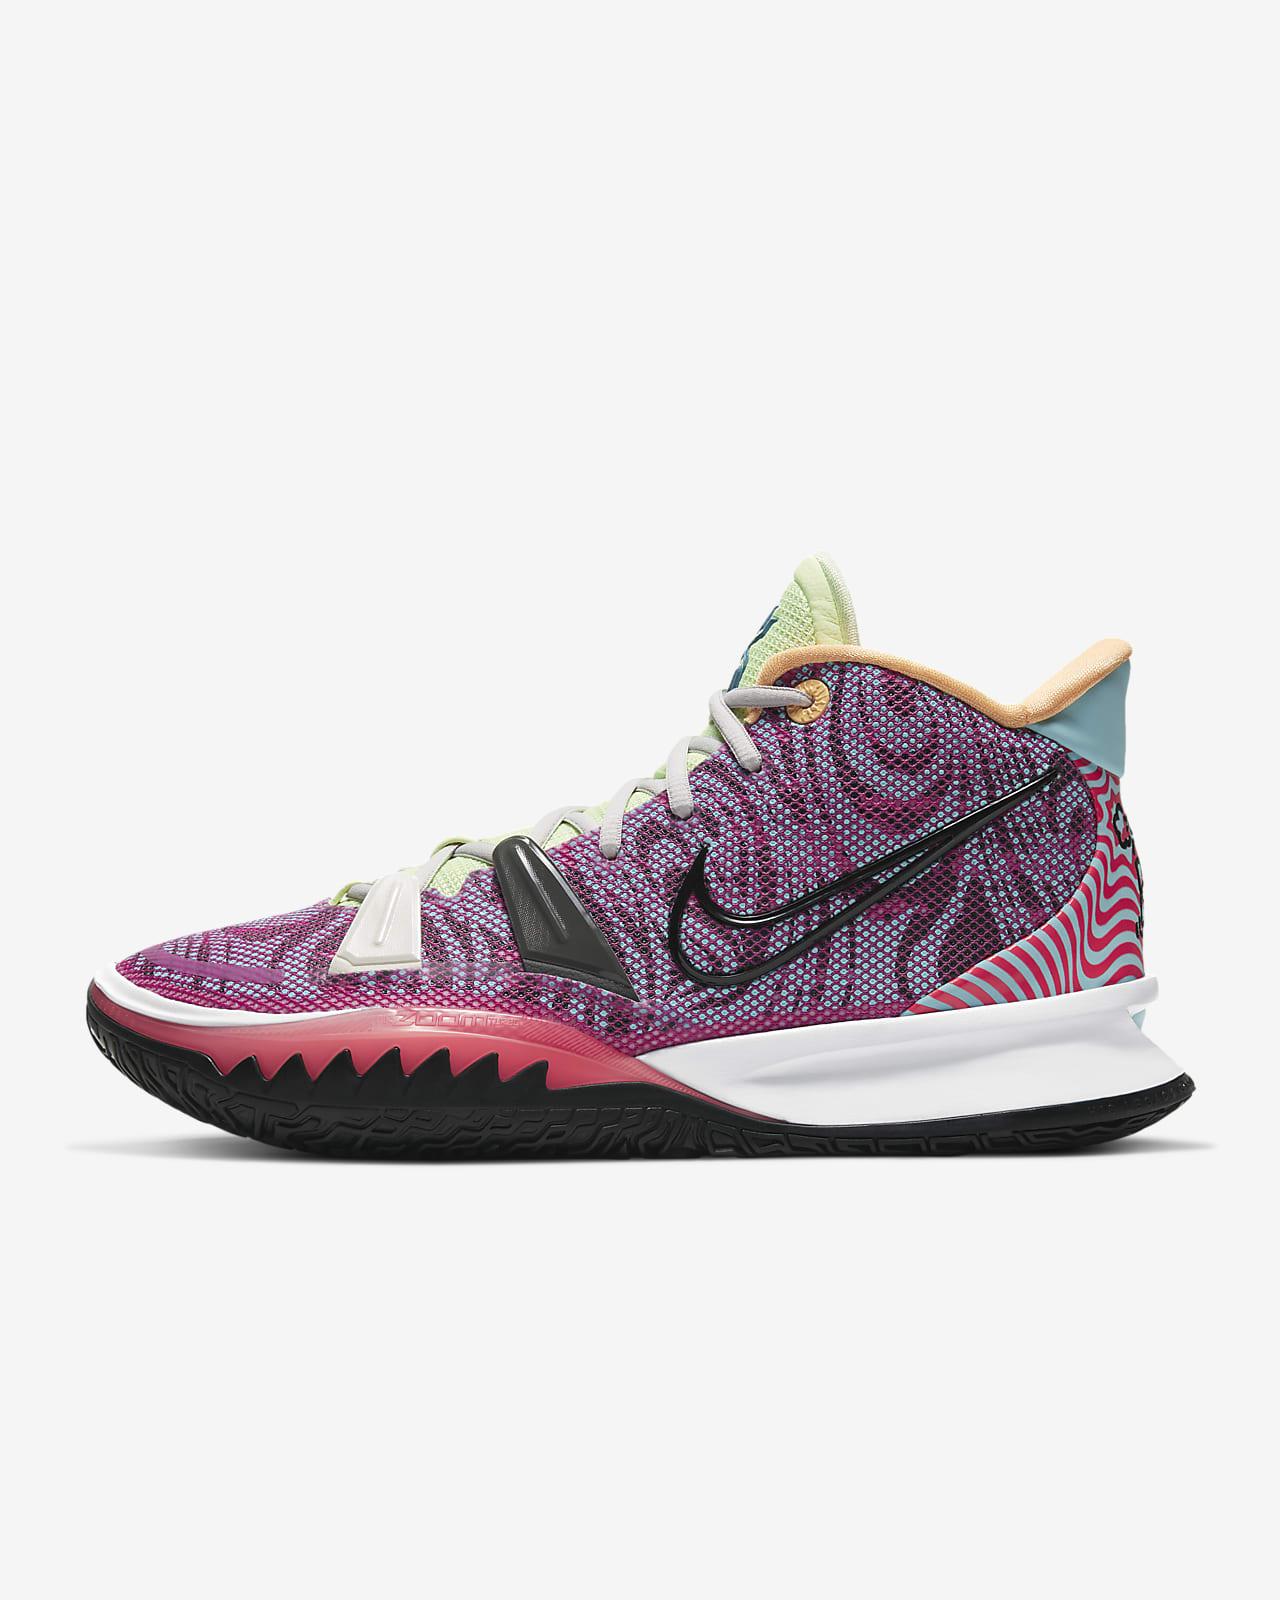 Kyrie 7 'Creator' Basketball Shoe